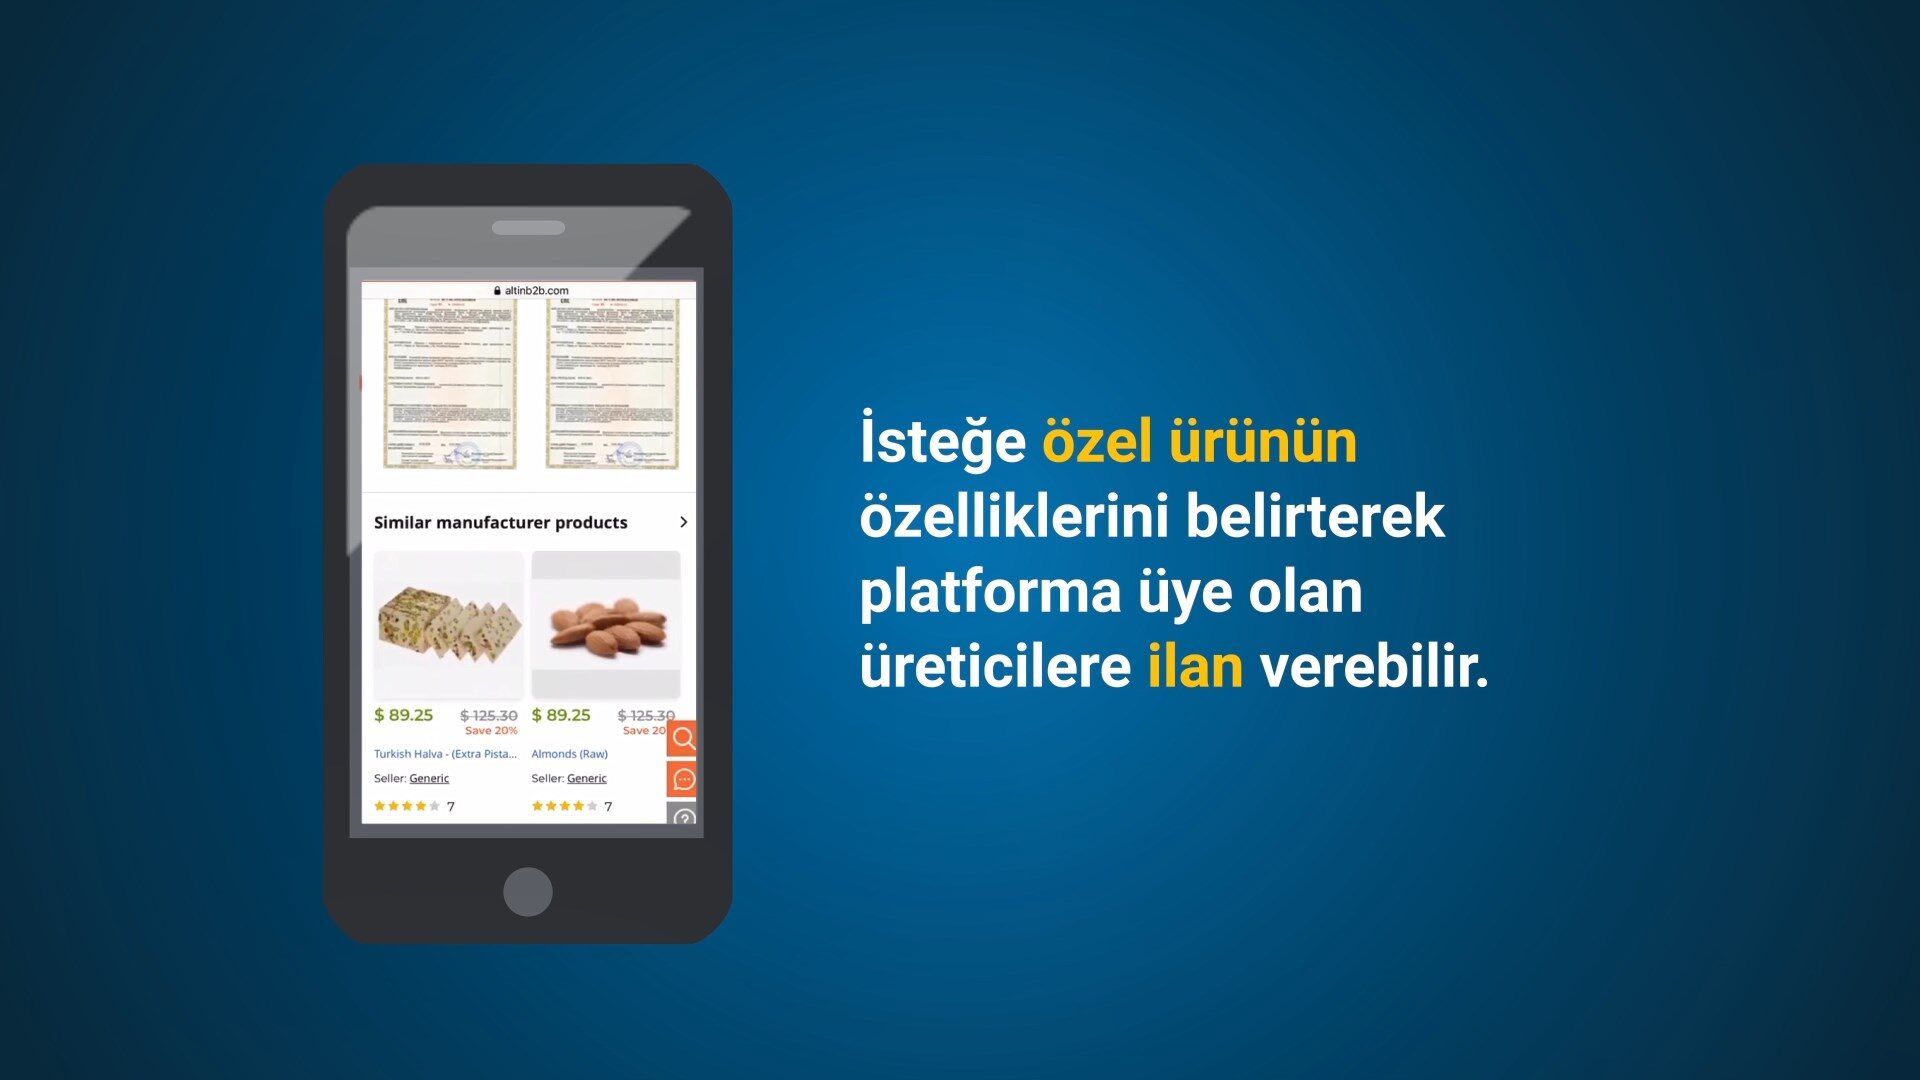 TürkTicaretMerkezi4.mp4 snapshot 01.30.960 1920x1080 -